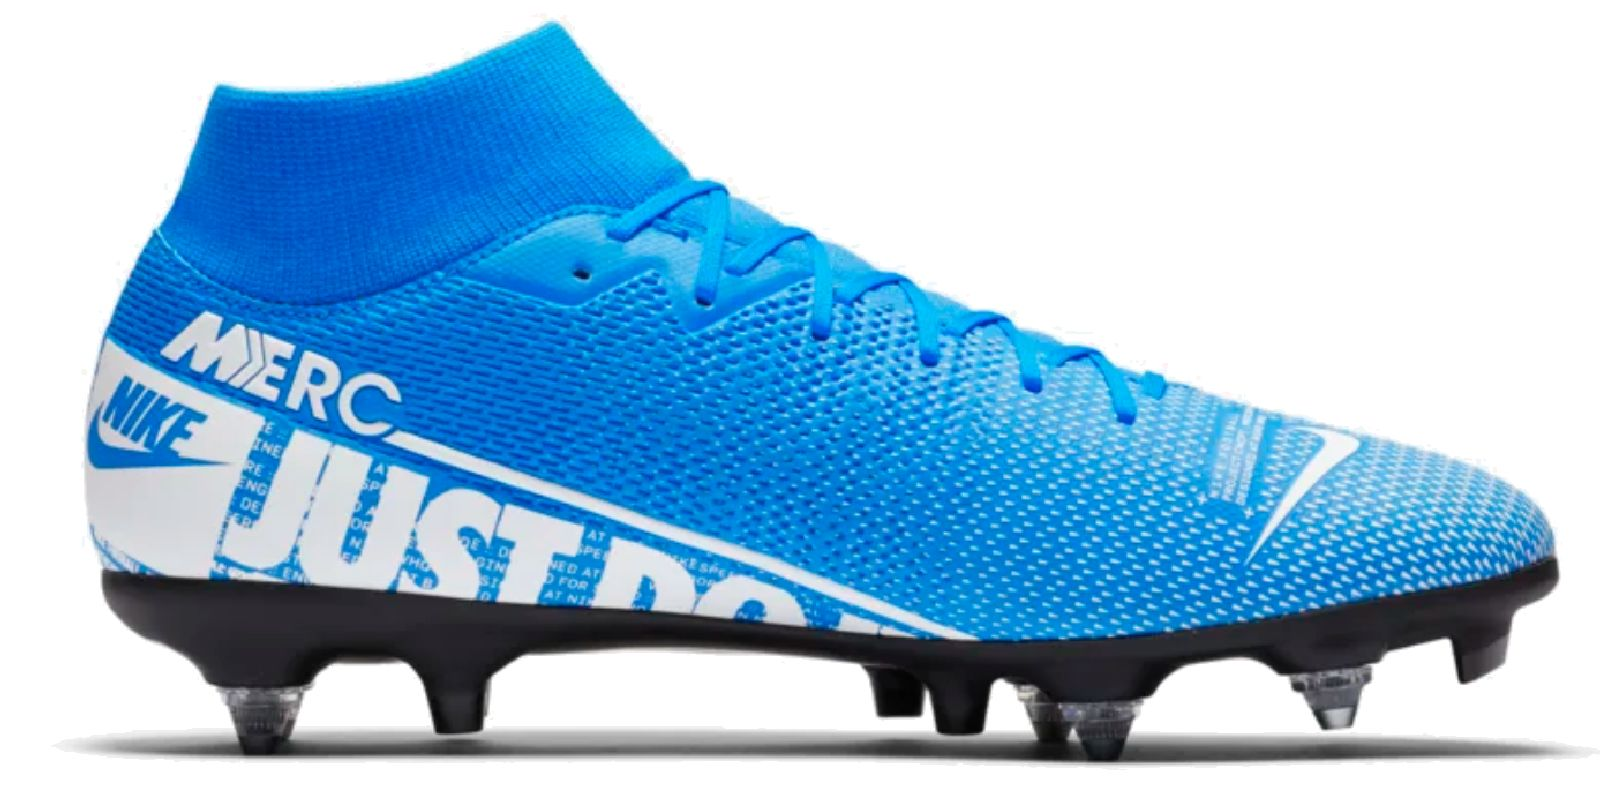 pecador exposición Humano  Nike Fútbol Zapatos Enlistonados Mercurial Superfly 7 Academy Sg ...